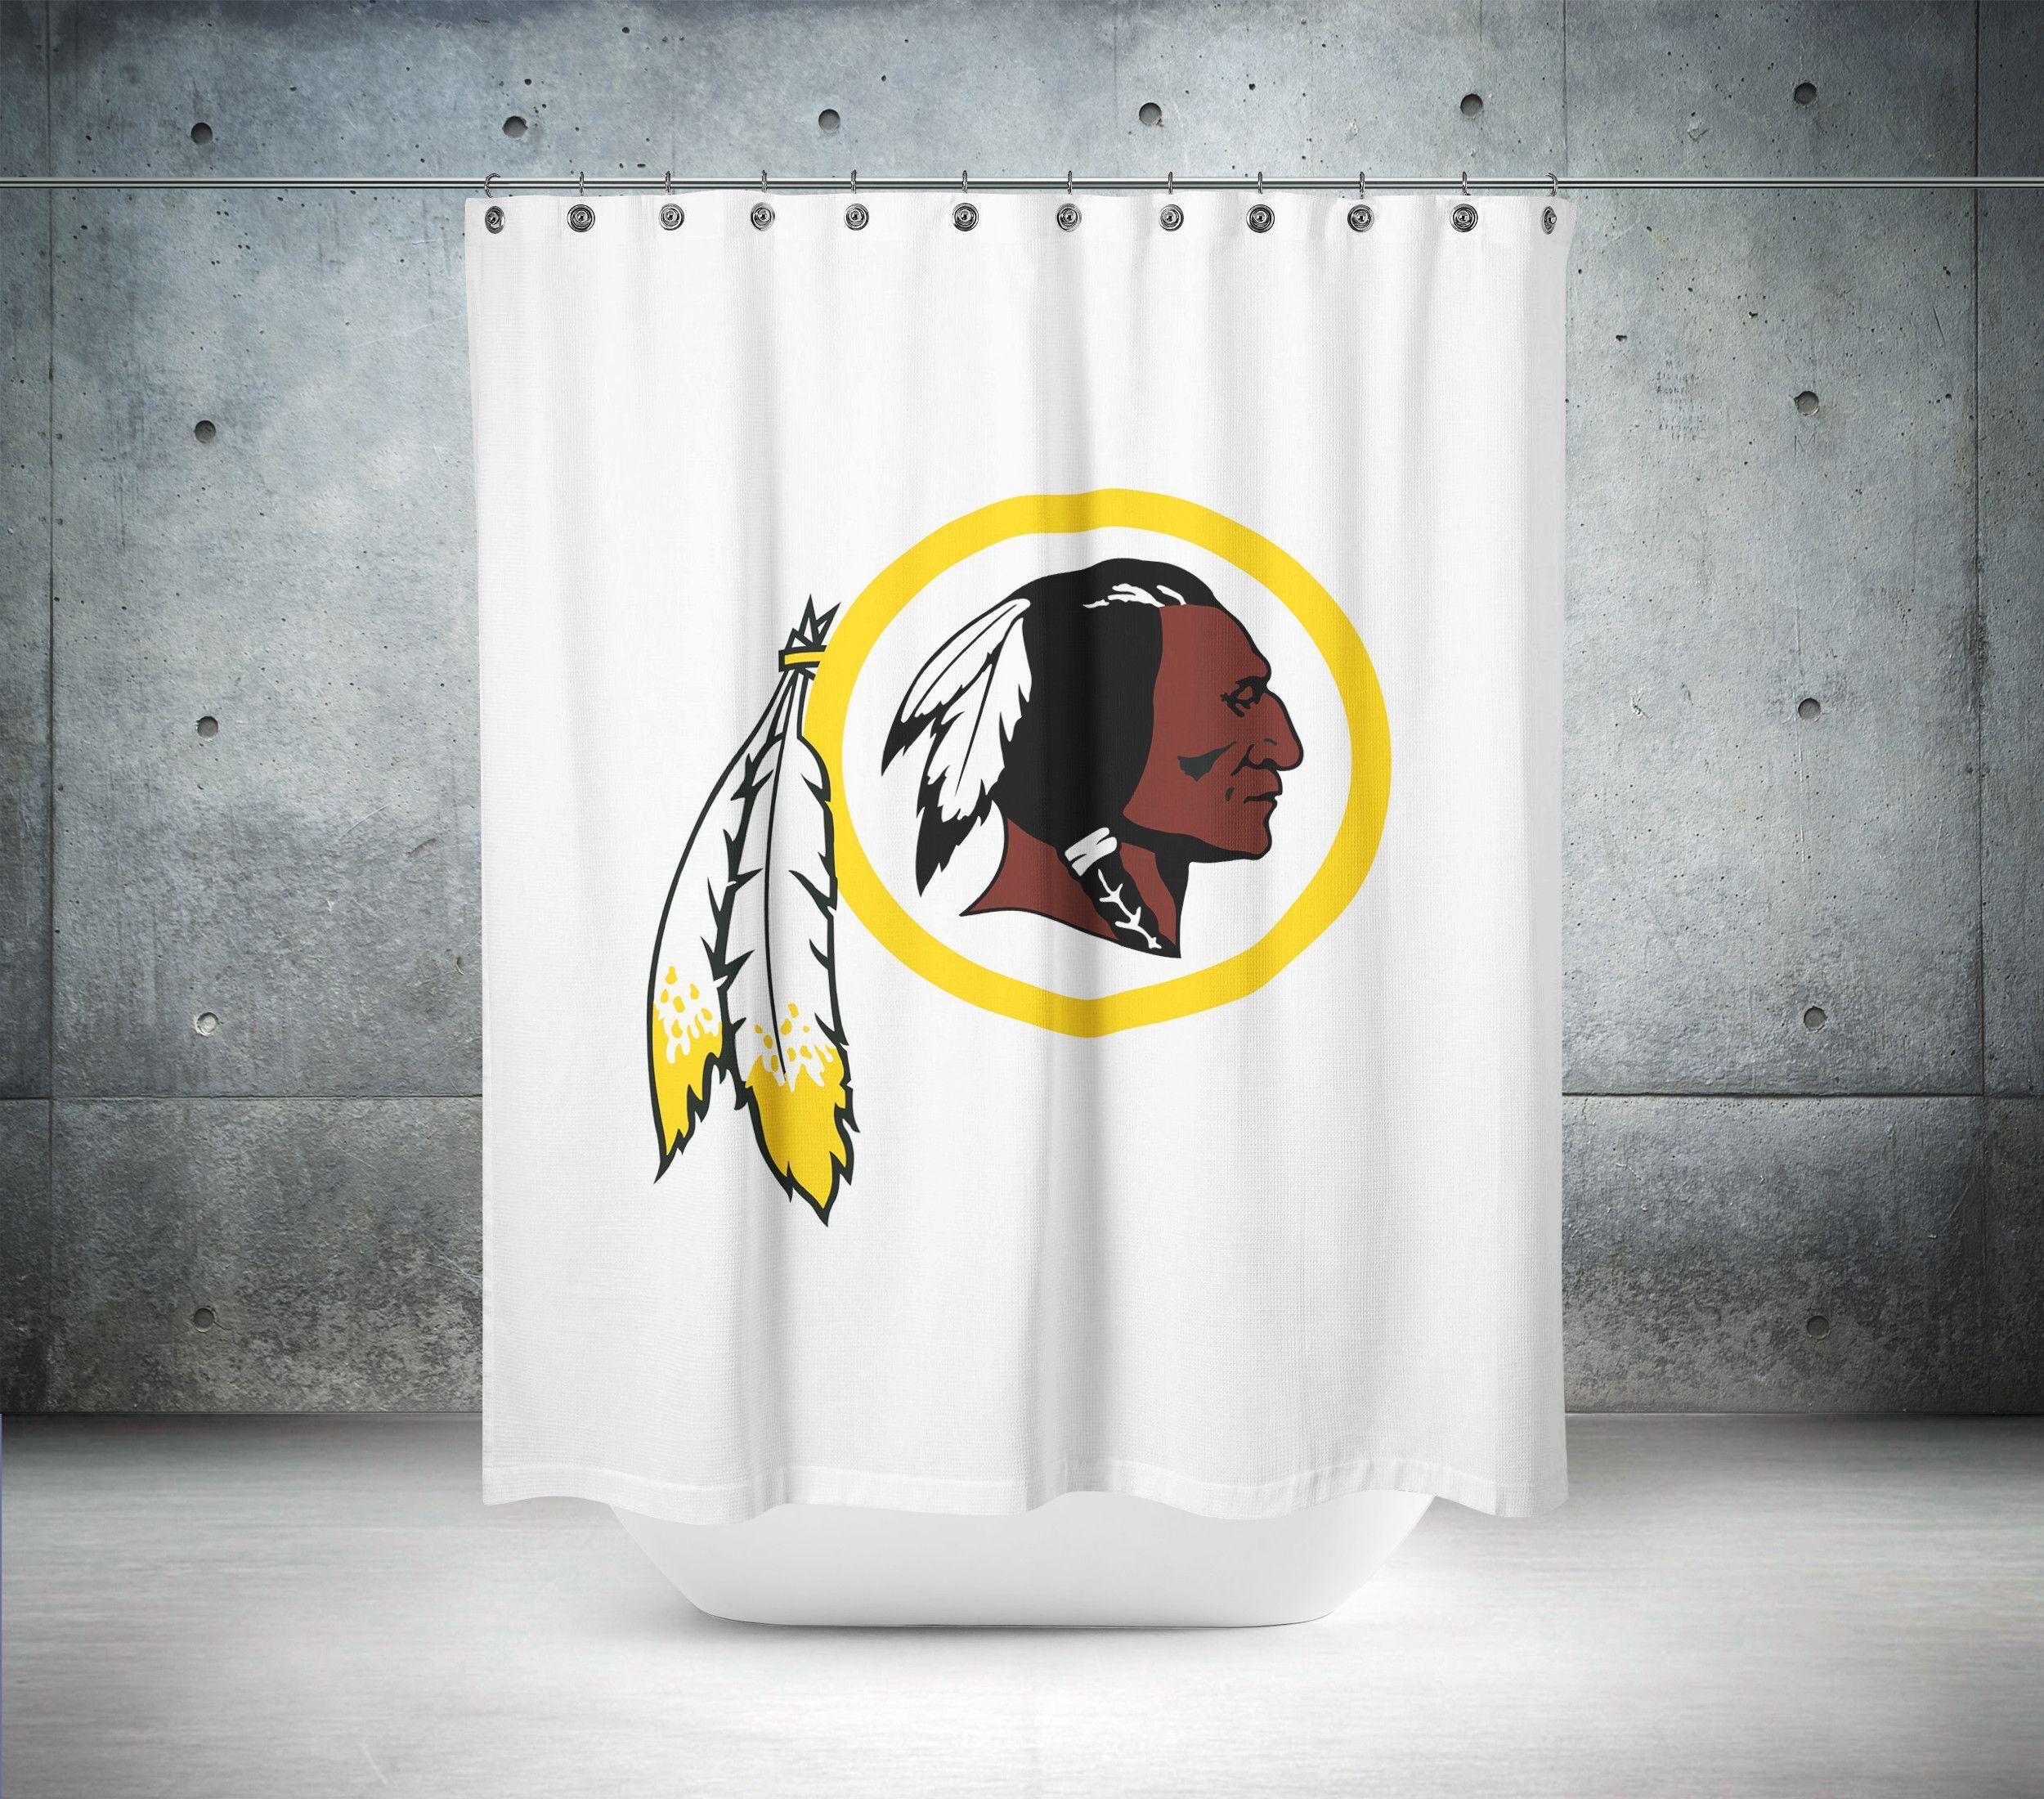 Washington Redskins NFL Shower Curtain